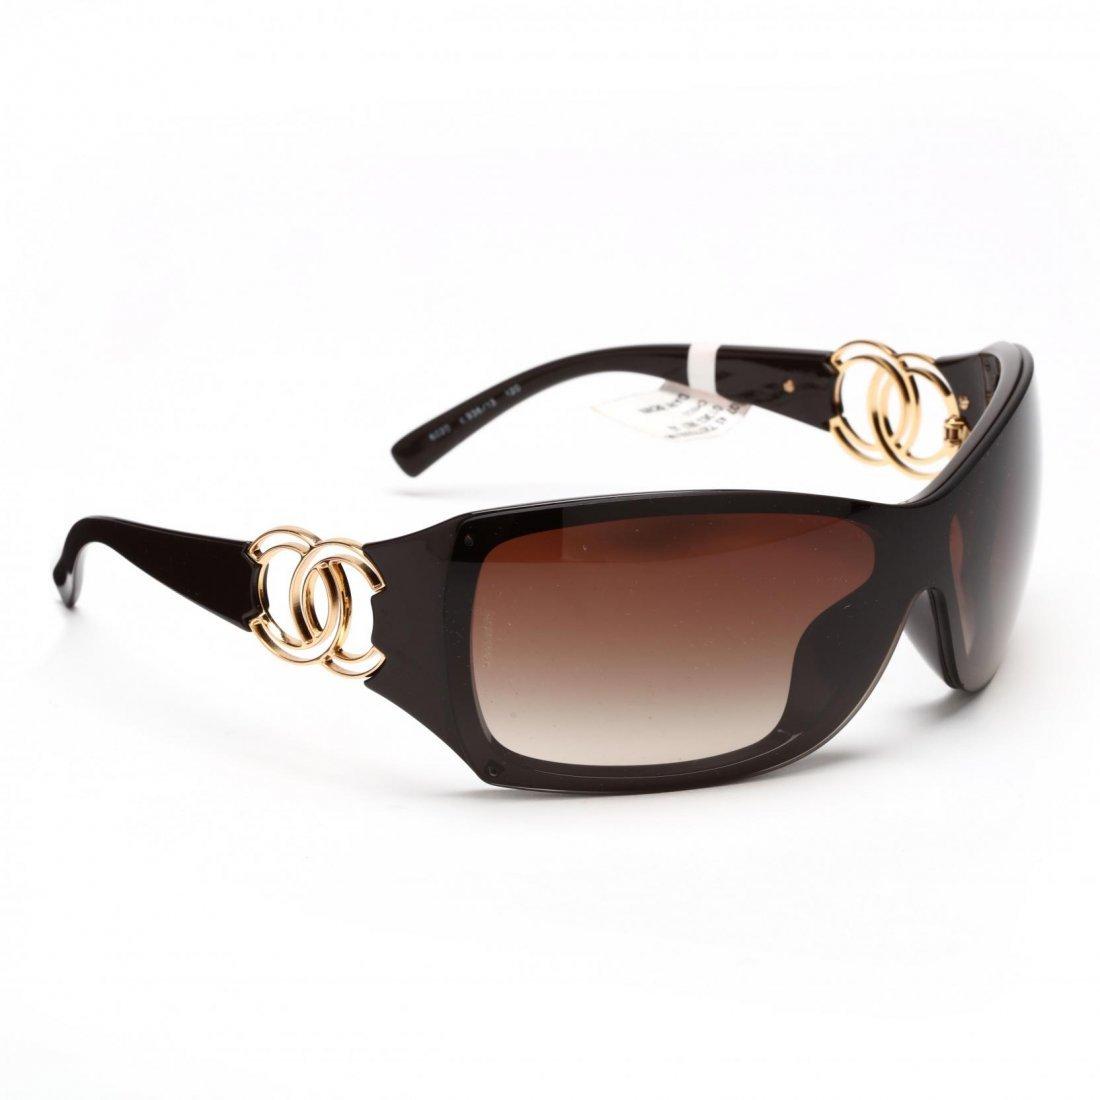 Logo Sunglasses, Chanel